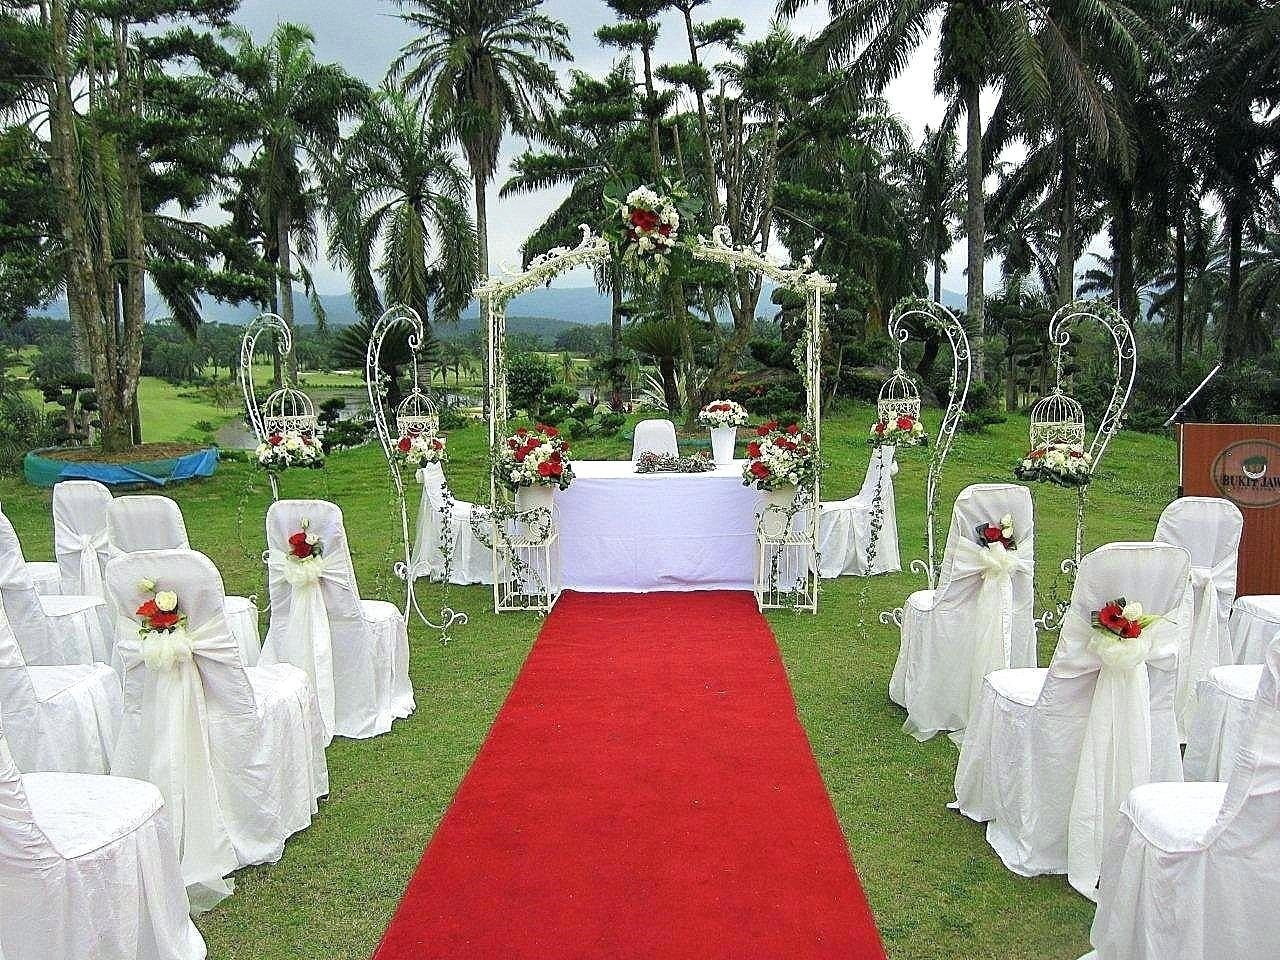 10 Cute Backyard Wedding Ideas For Summer backyard wedding ideas simple cheap backyard wedding ideas outdoor 2020